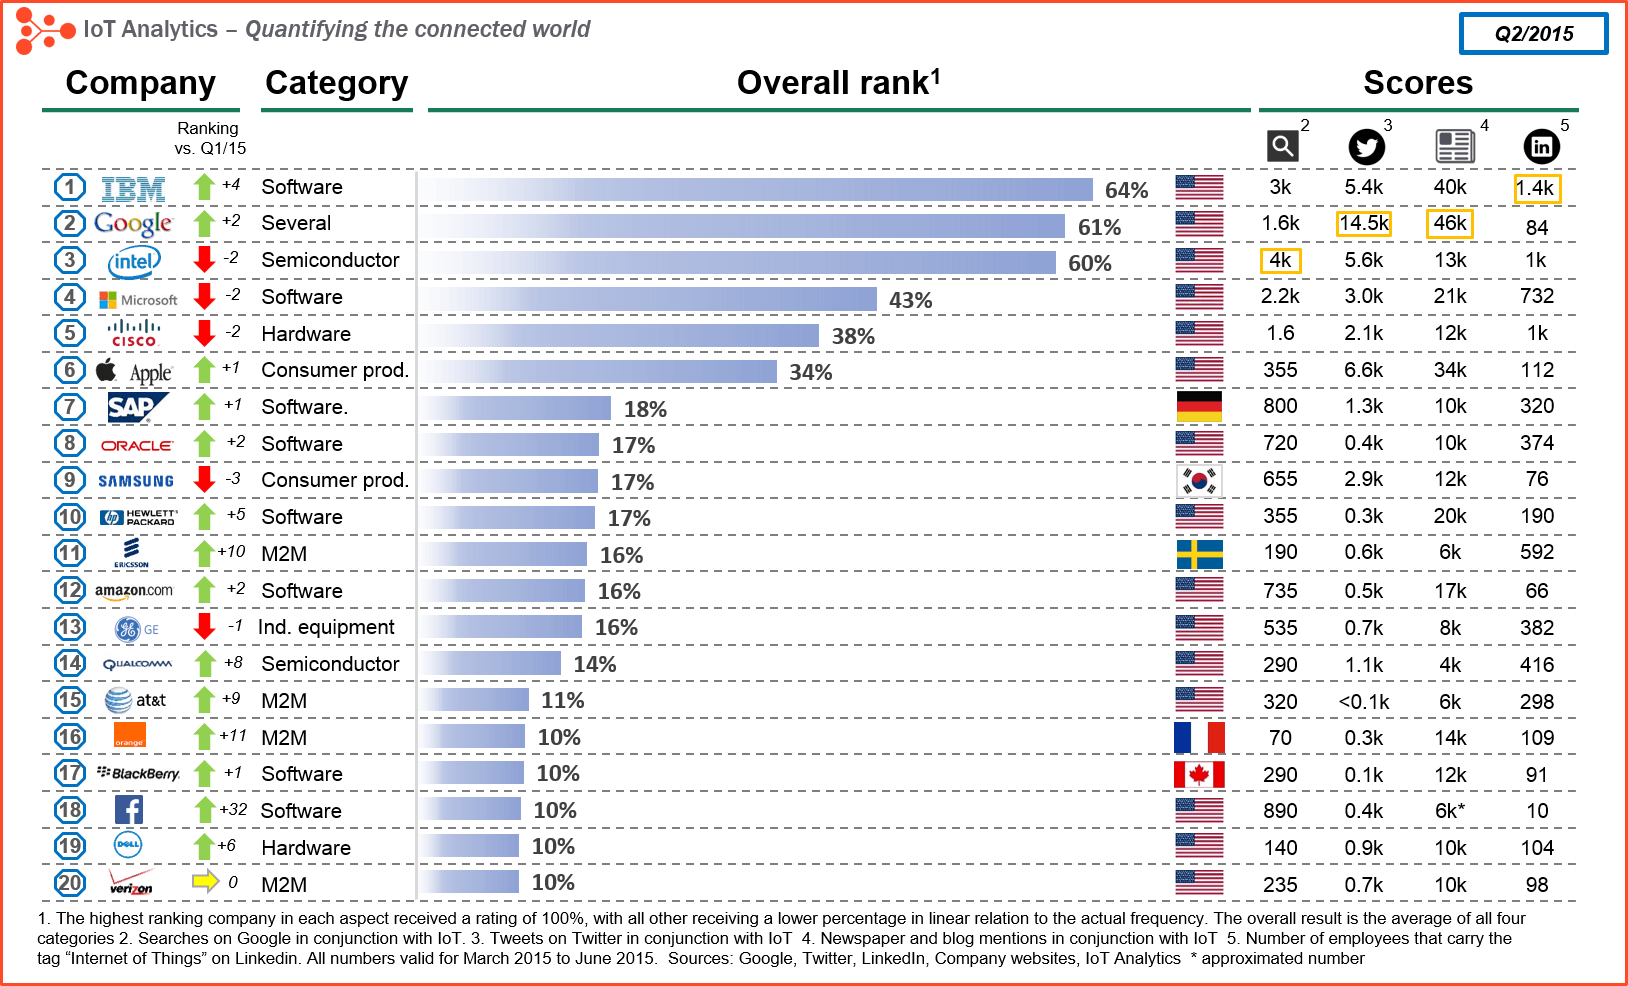 iot companies ranking